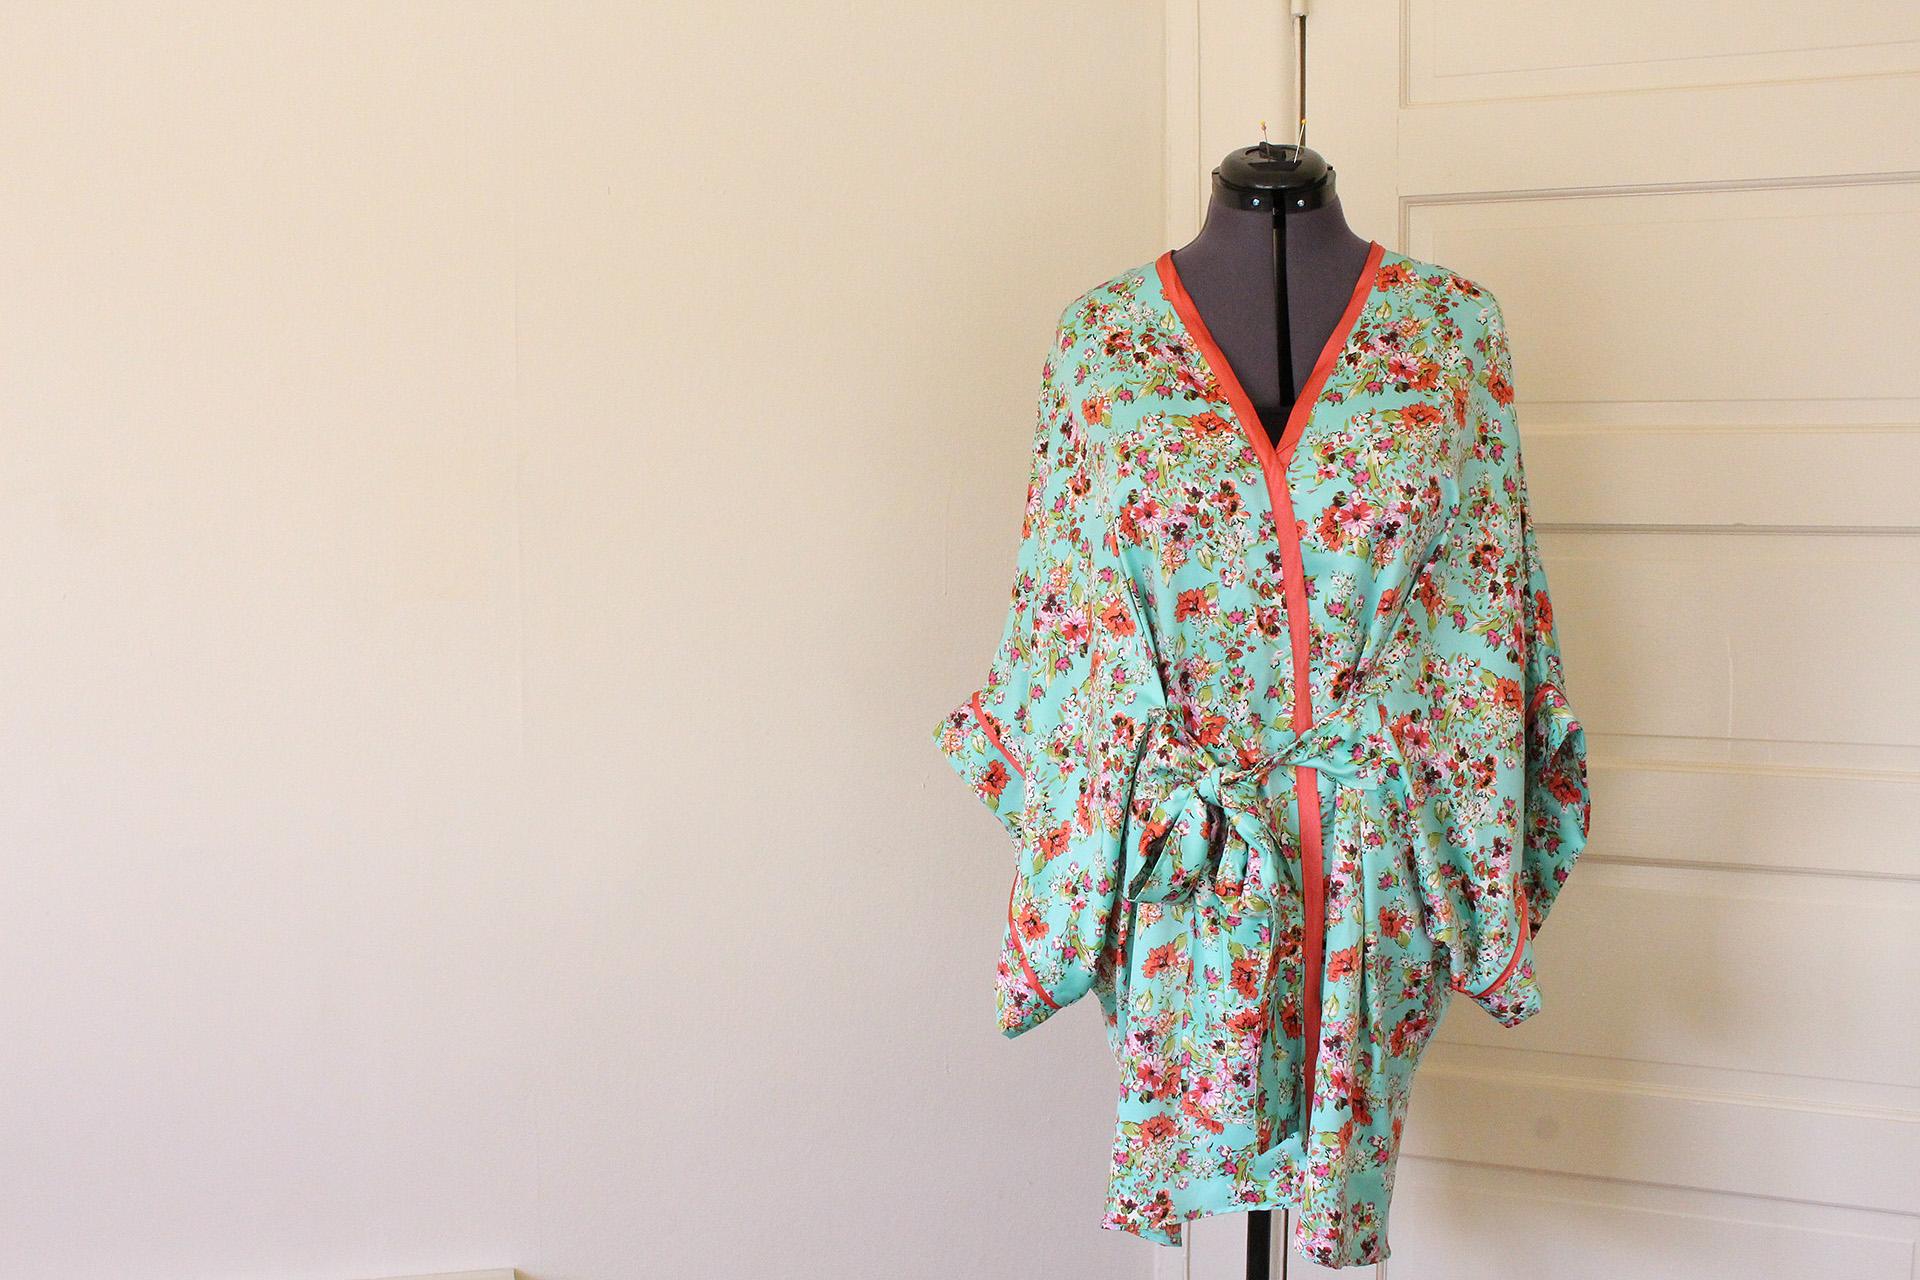 Completed Seamwork Almada Robe | @vintageontap